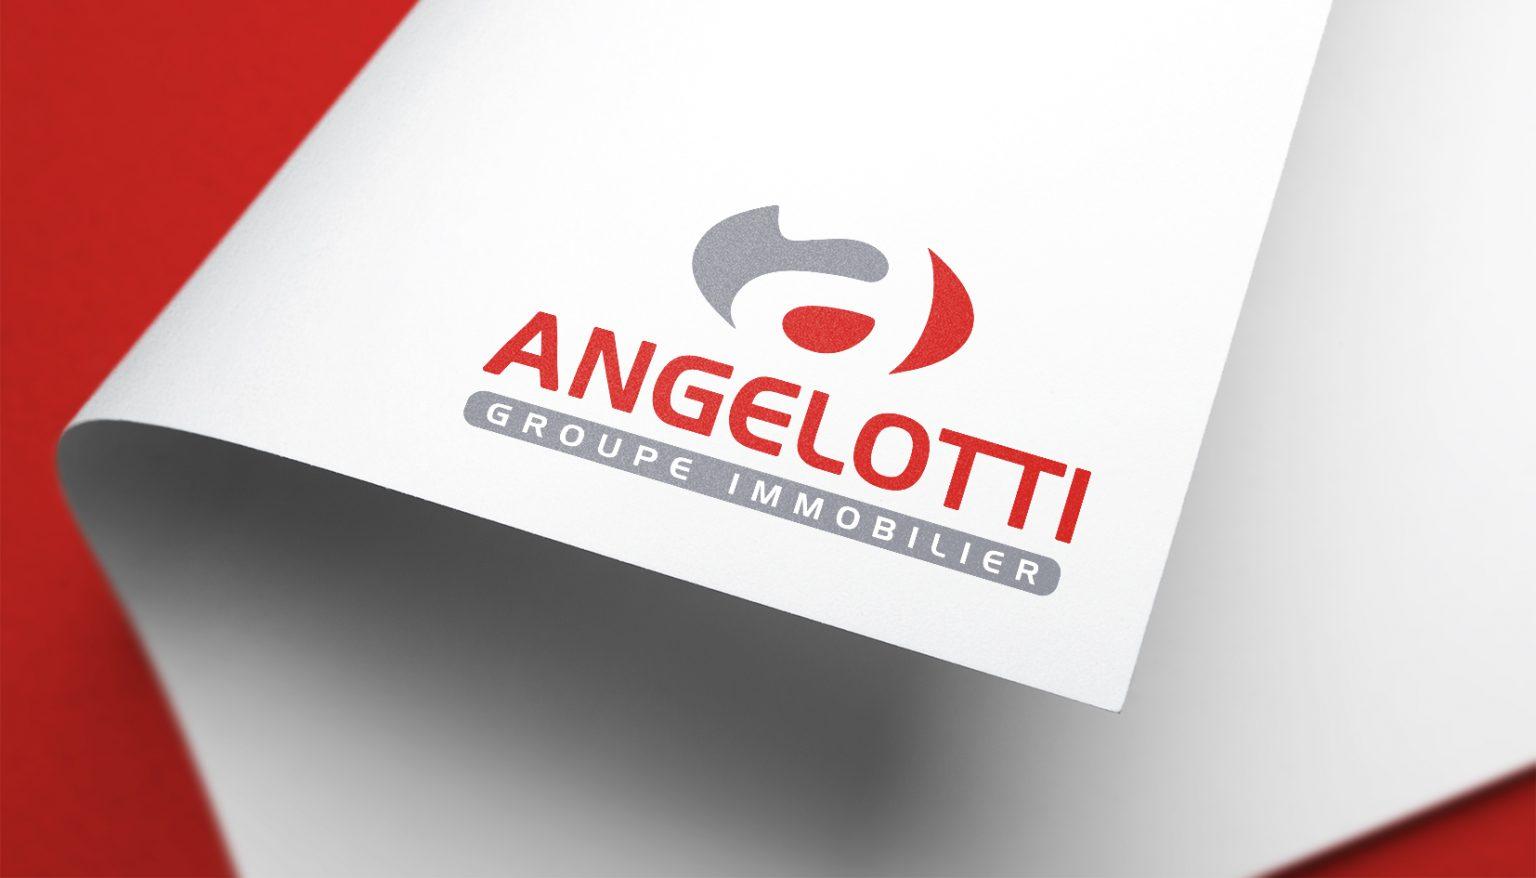 ANGELOTTI-close-up-logo